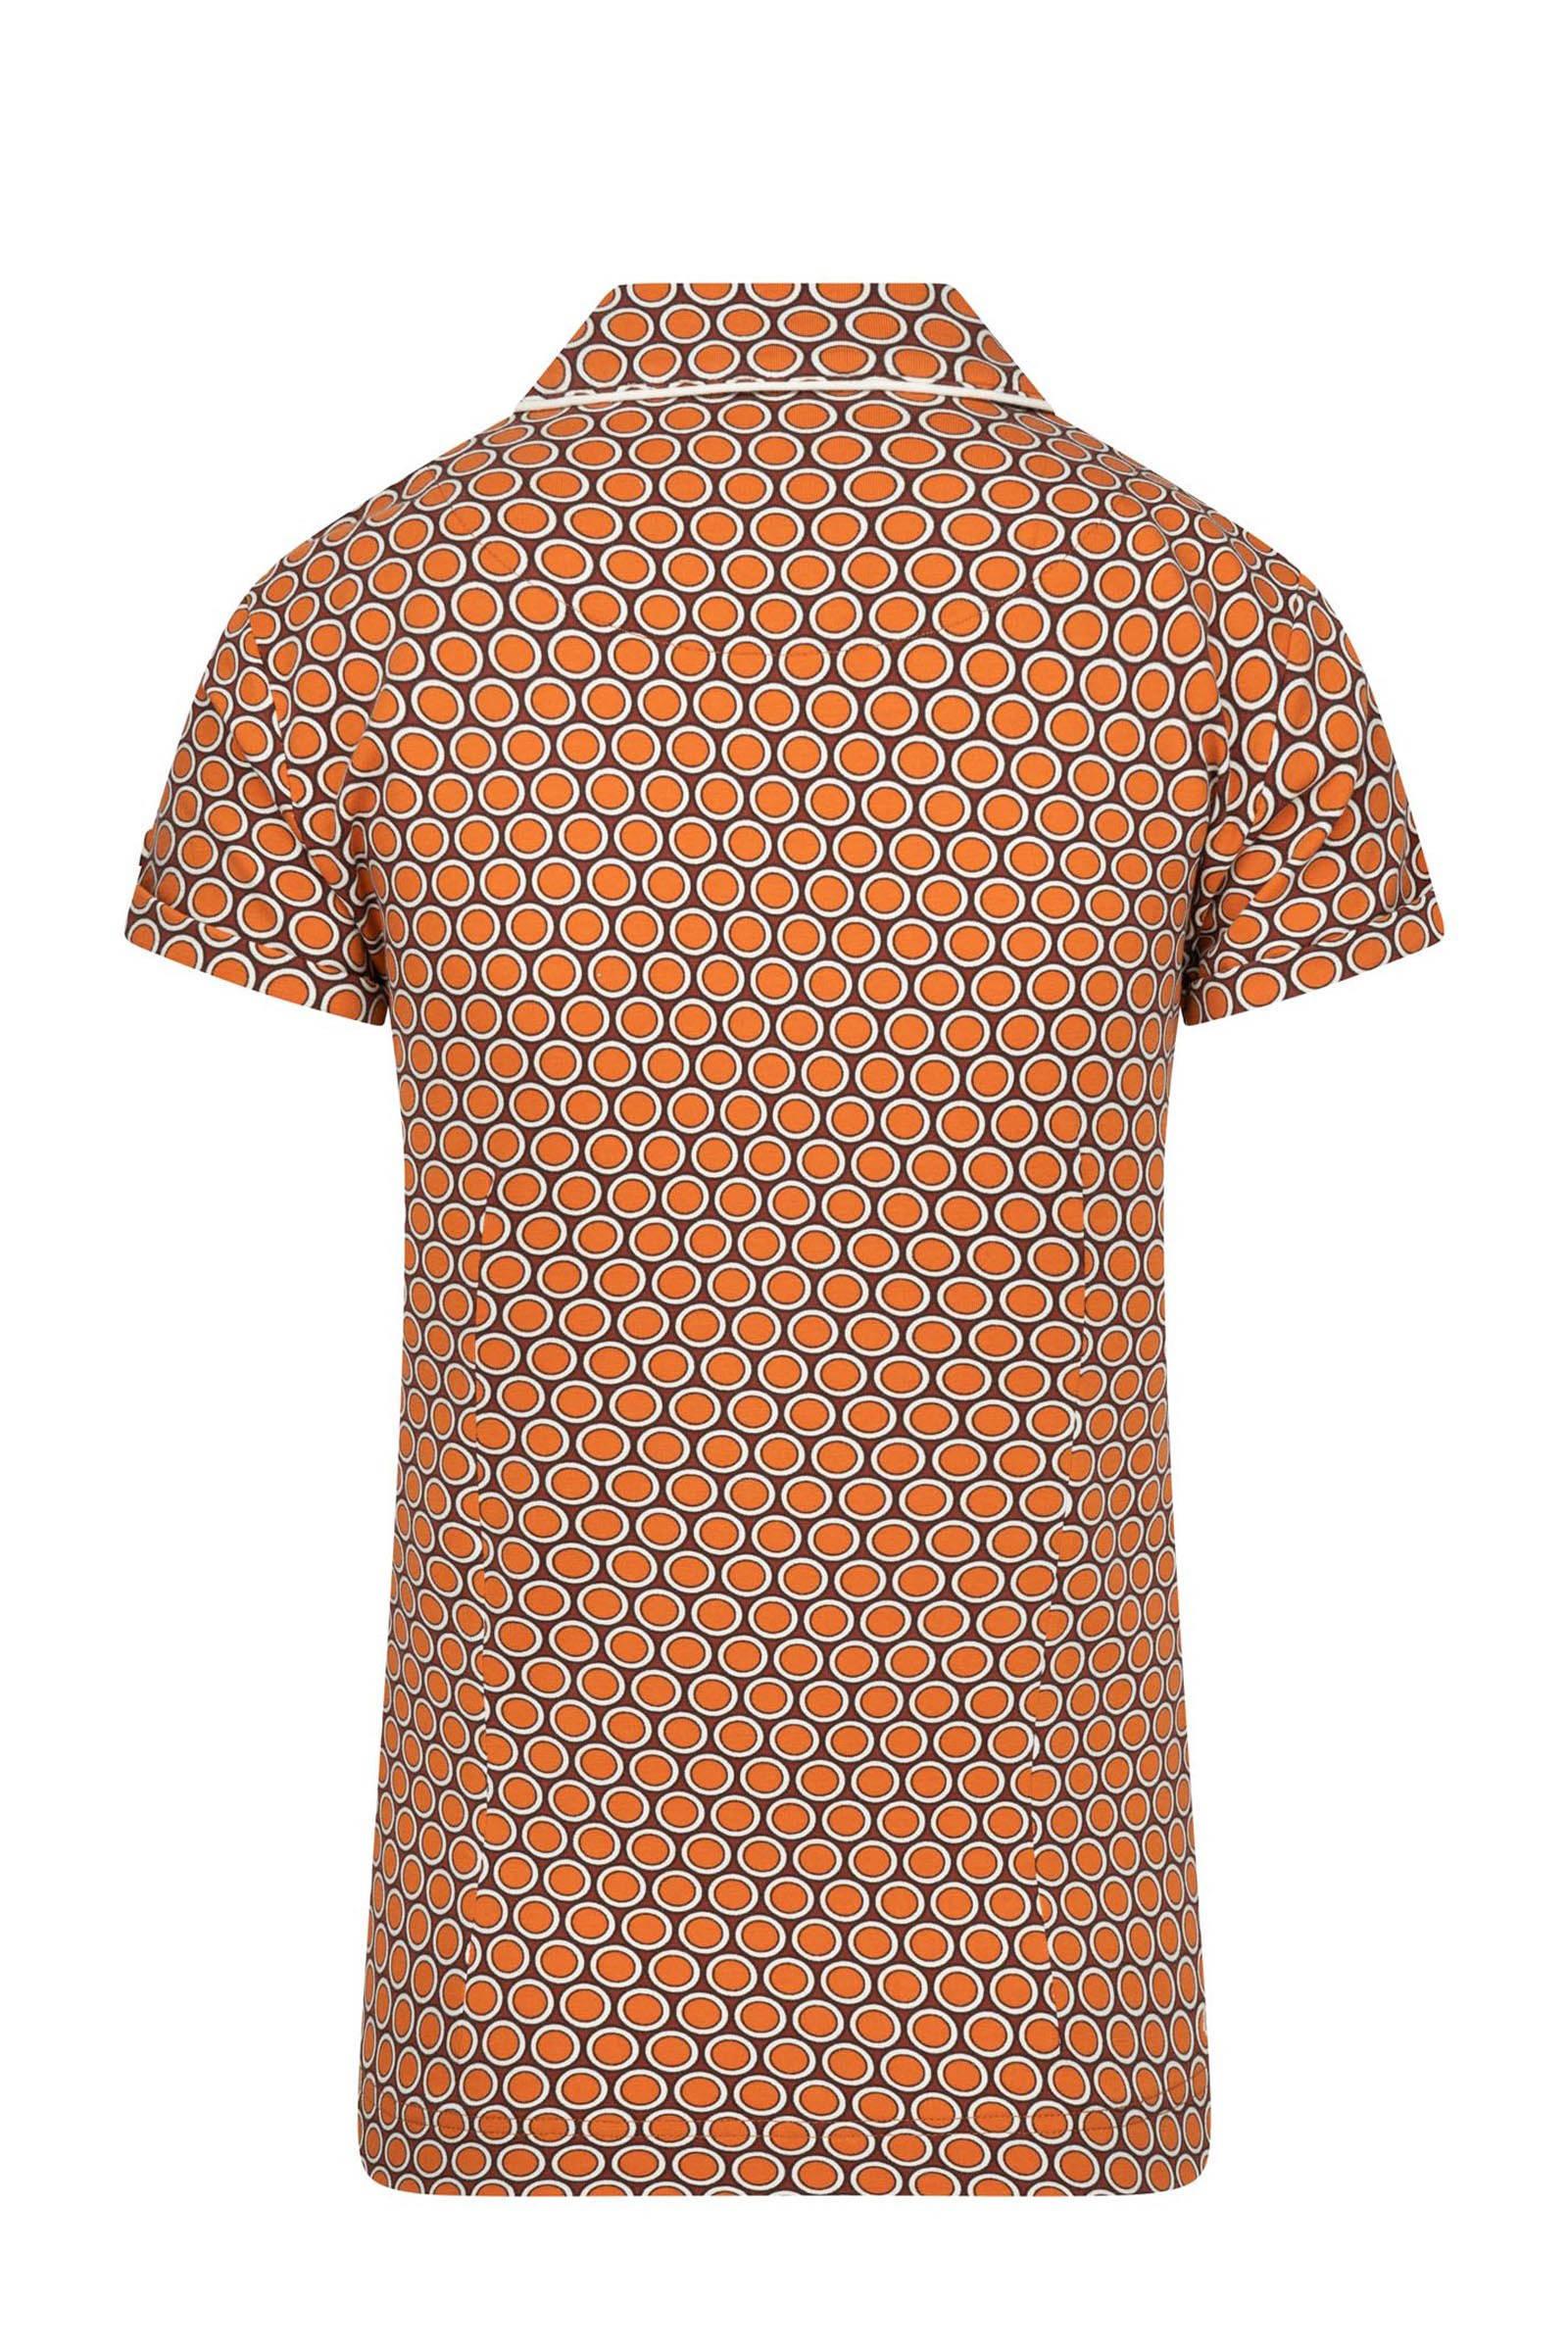 4funkyflavours top Lay It On The Line met all over print oranje/multi